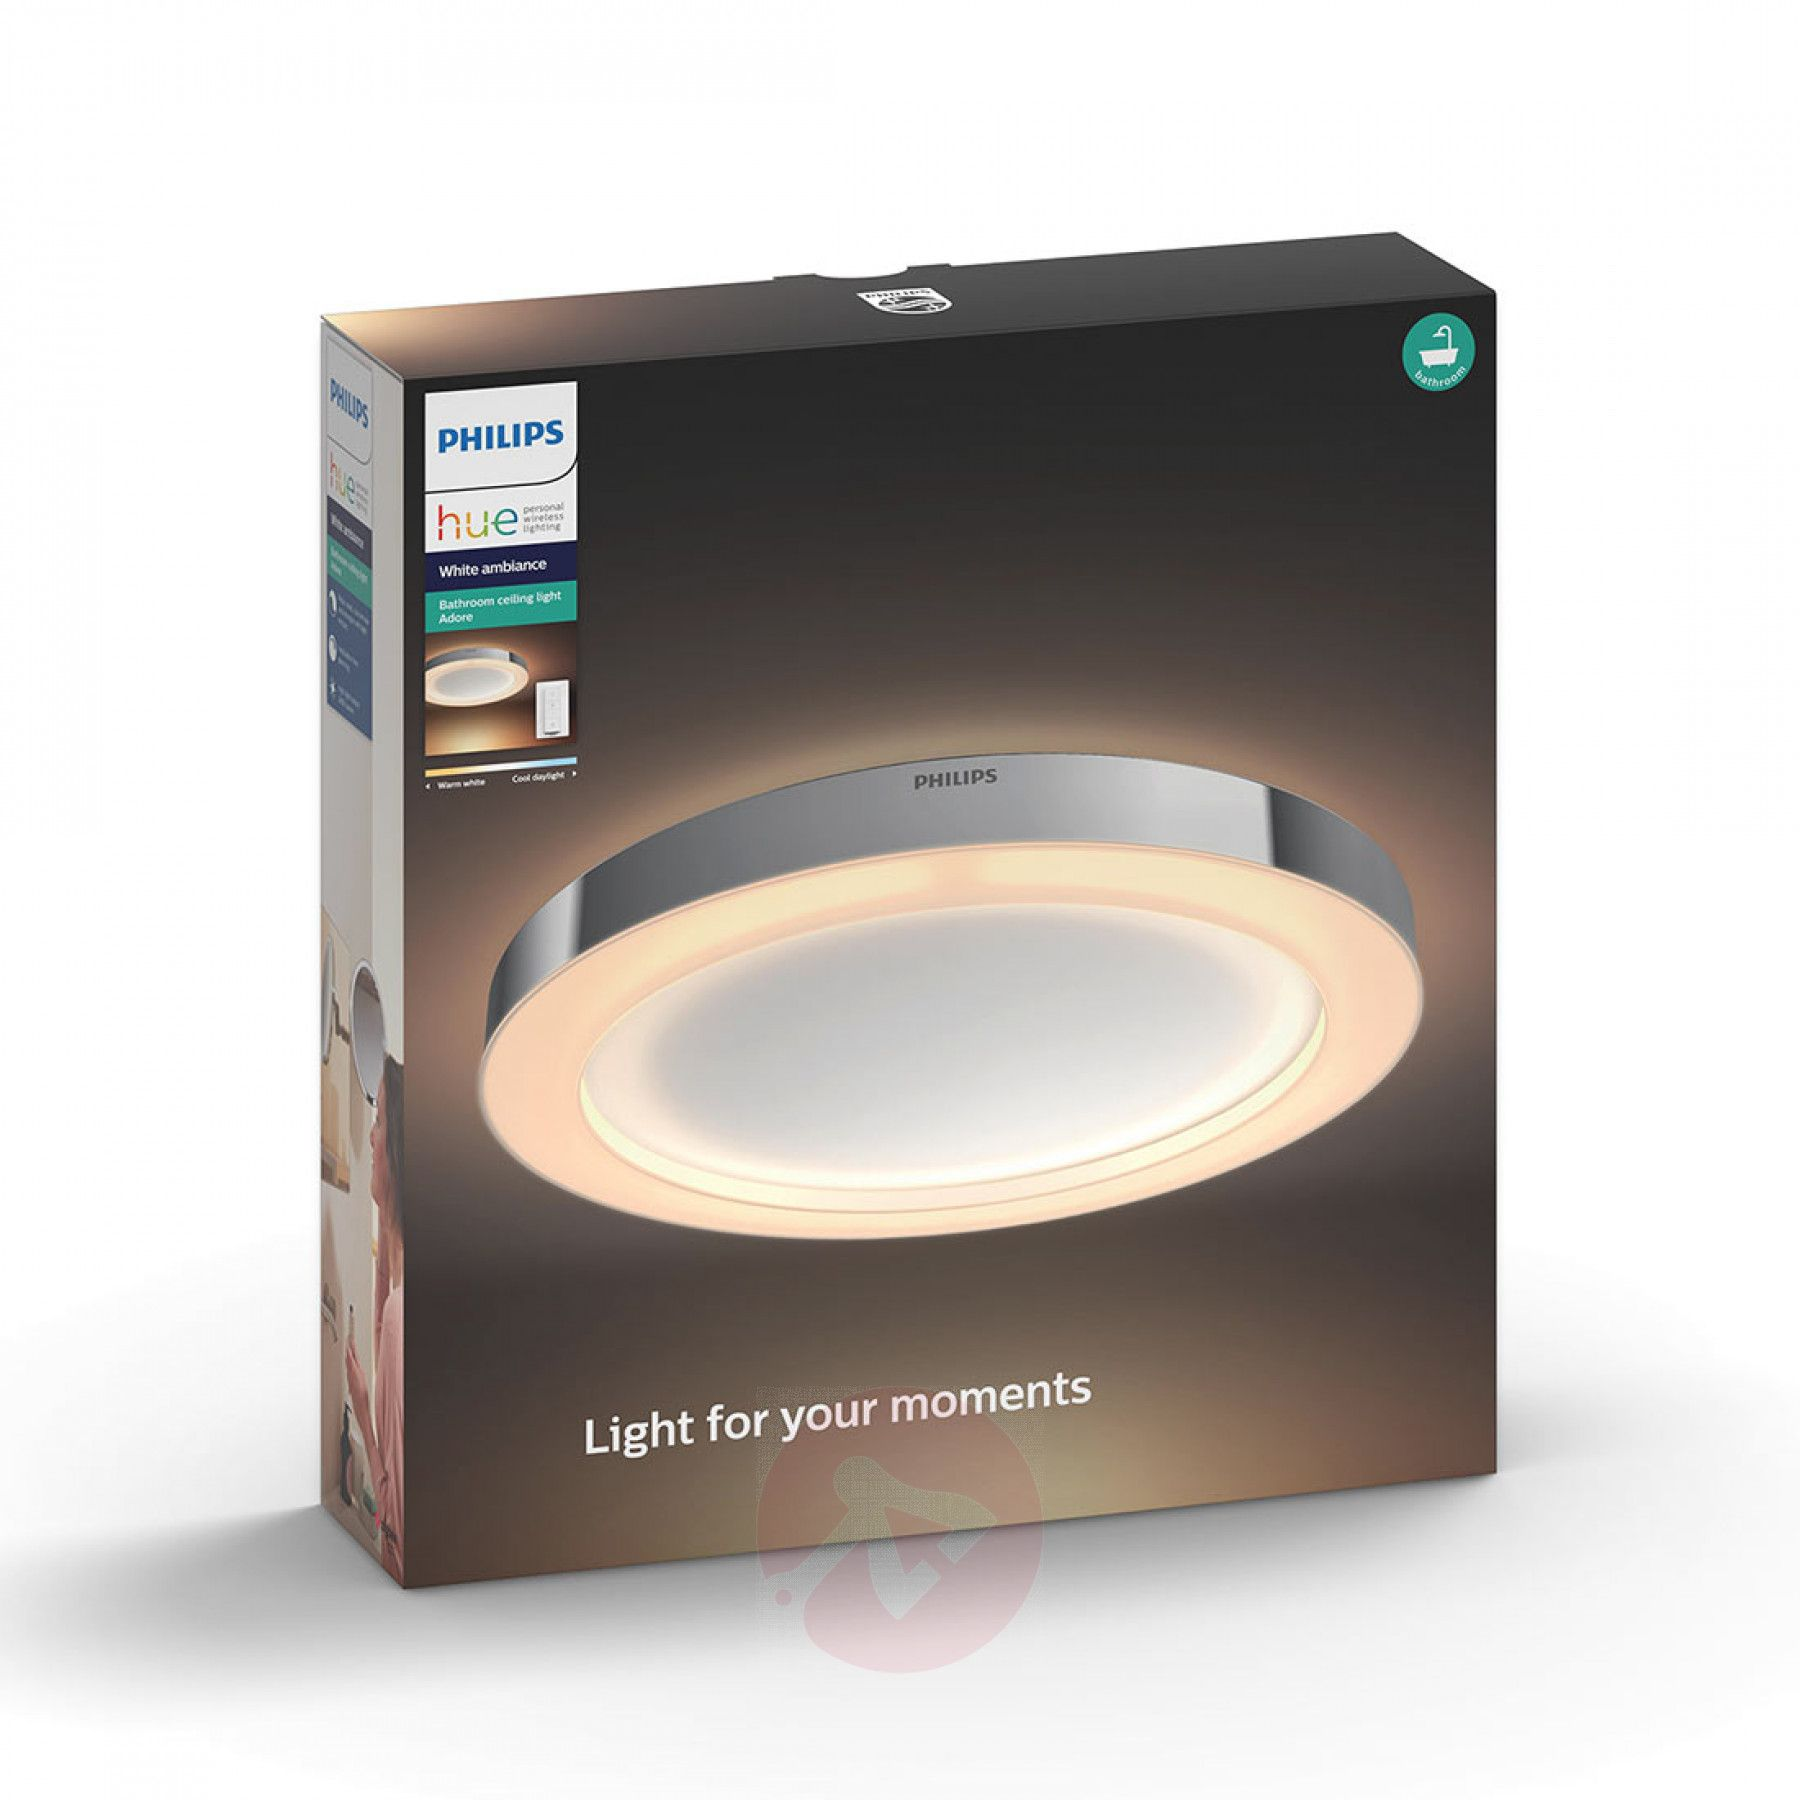 Philips Hue White Ambiance Adore Bad Deckenlampe Badbeleuchtung Deckenlampe Led Deckenleuchte